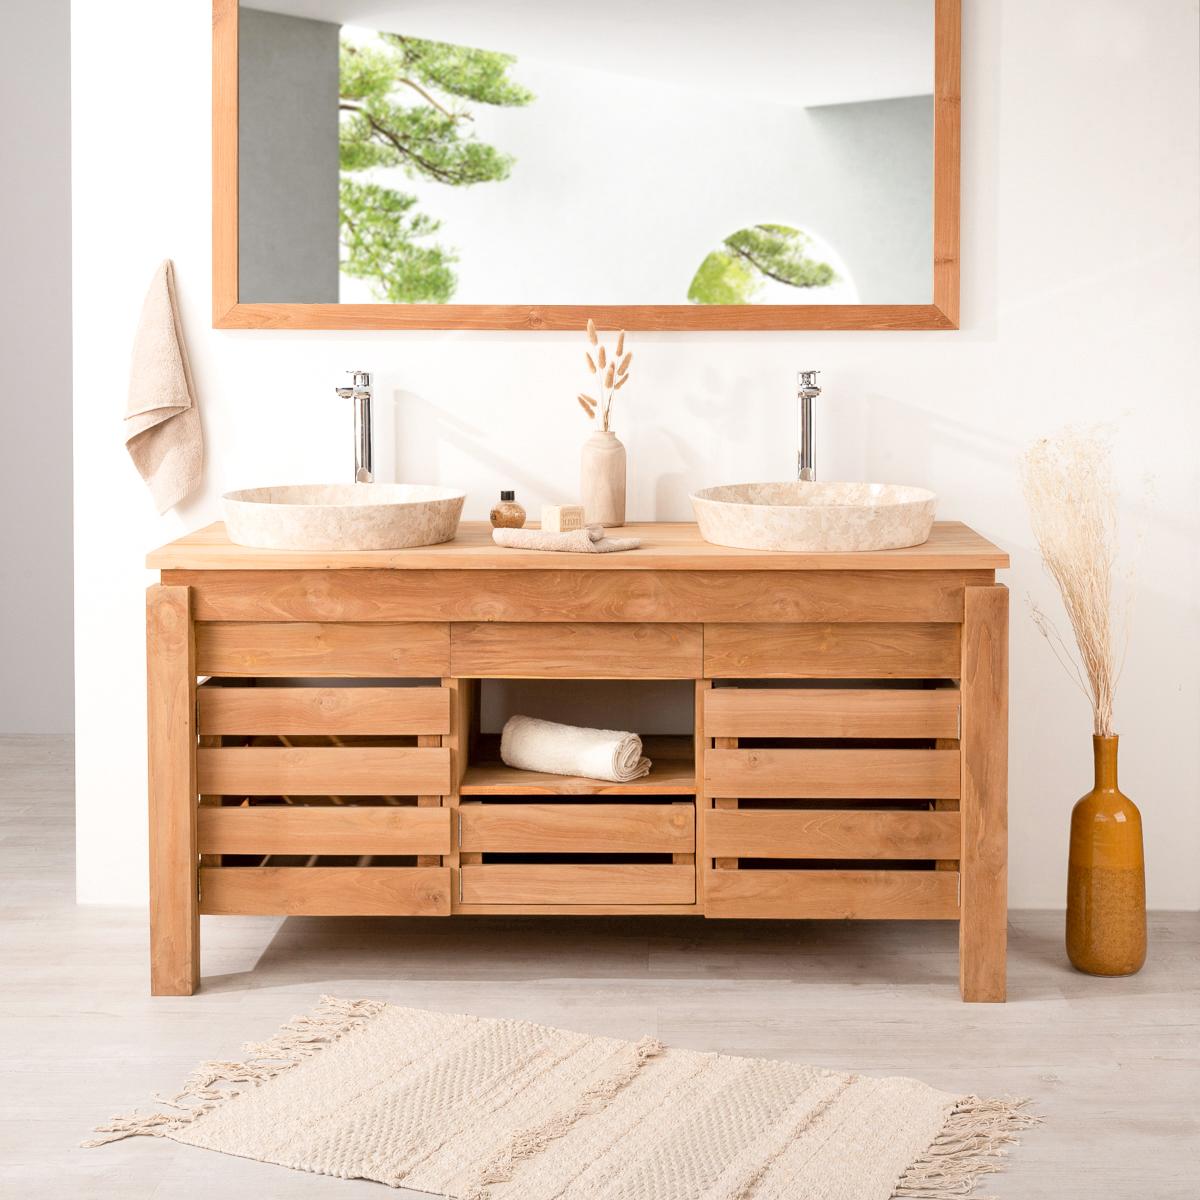 Mueble para lavabo doble de madera teca maciza zen for Oportunidades gaditanas muebles